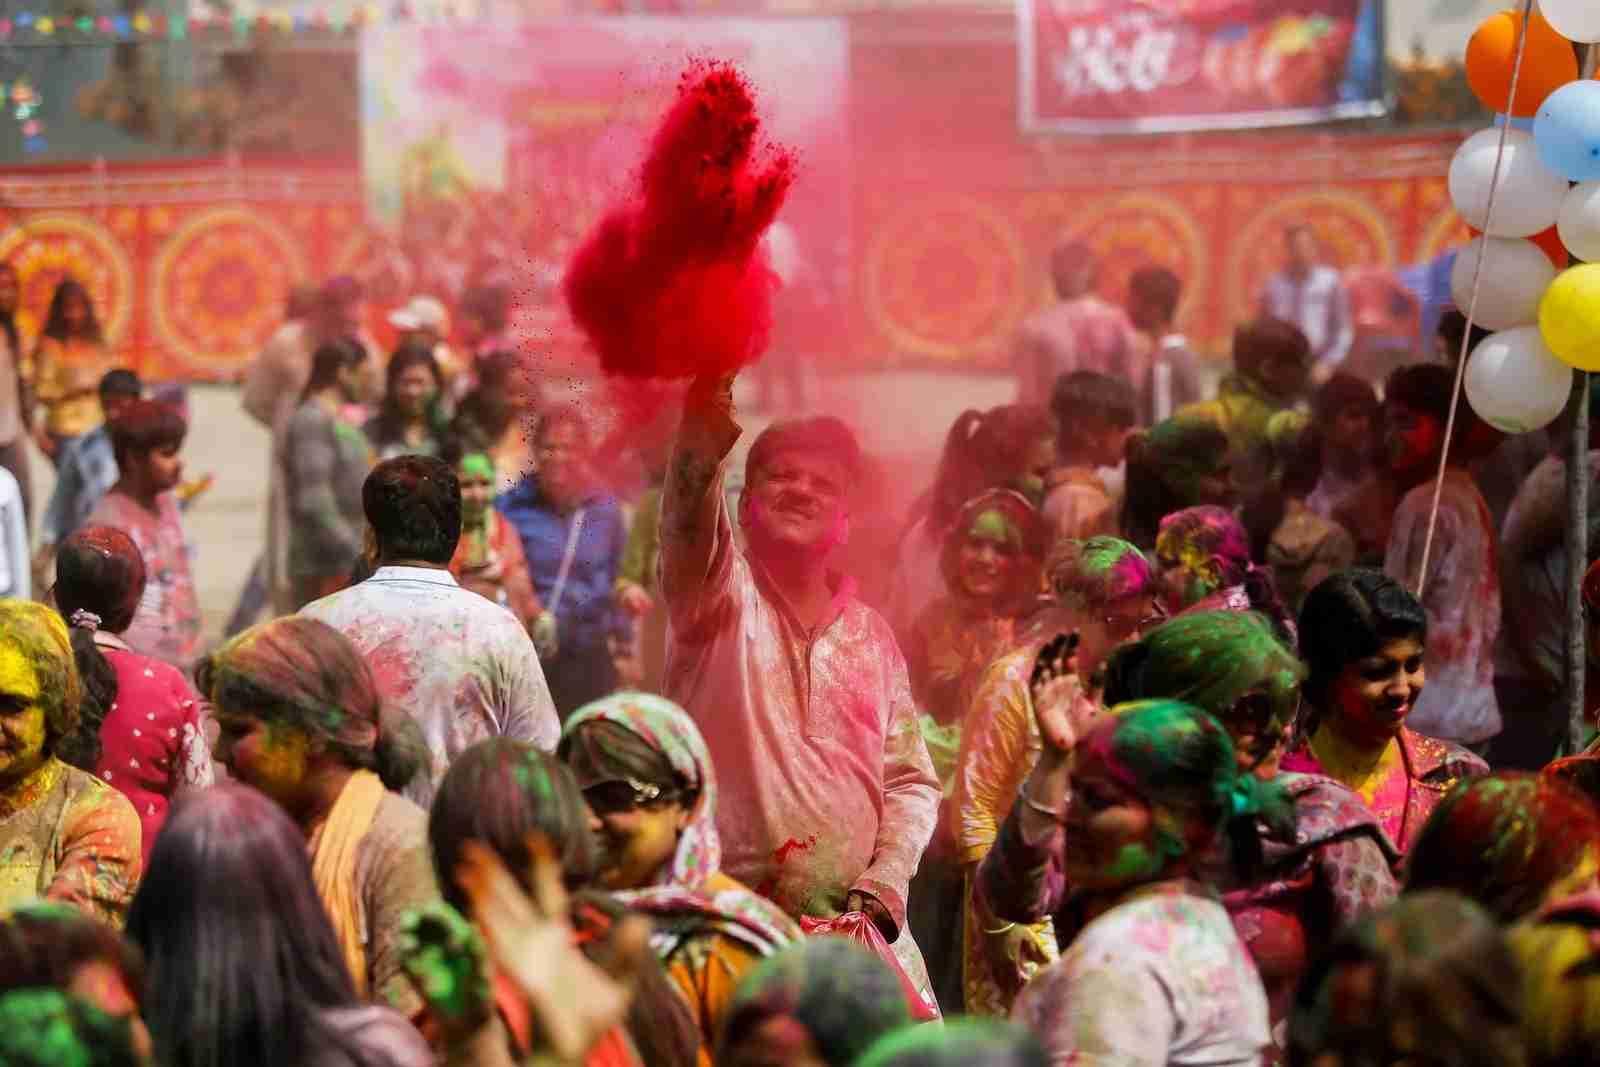 (Photo by Sunil Pradhan/NurPhoto/Getty Images)